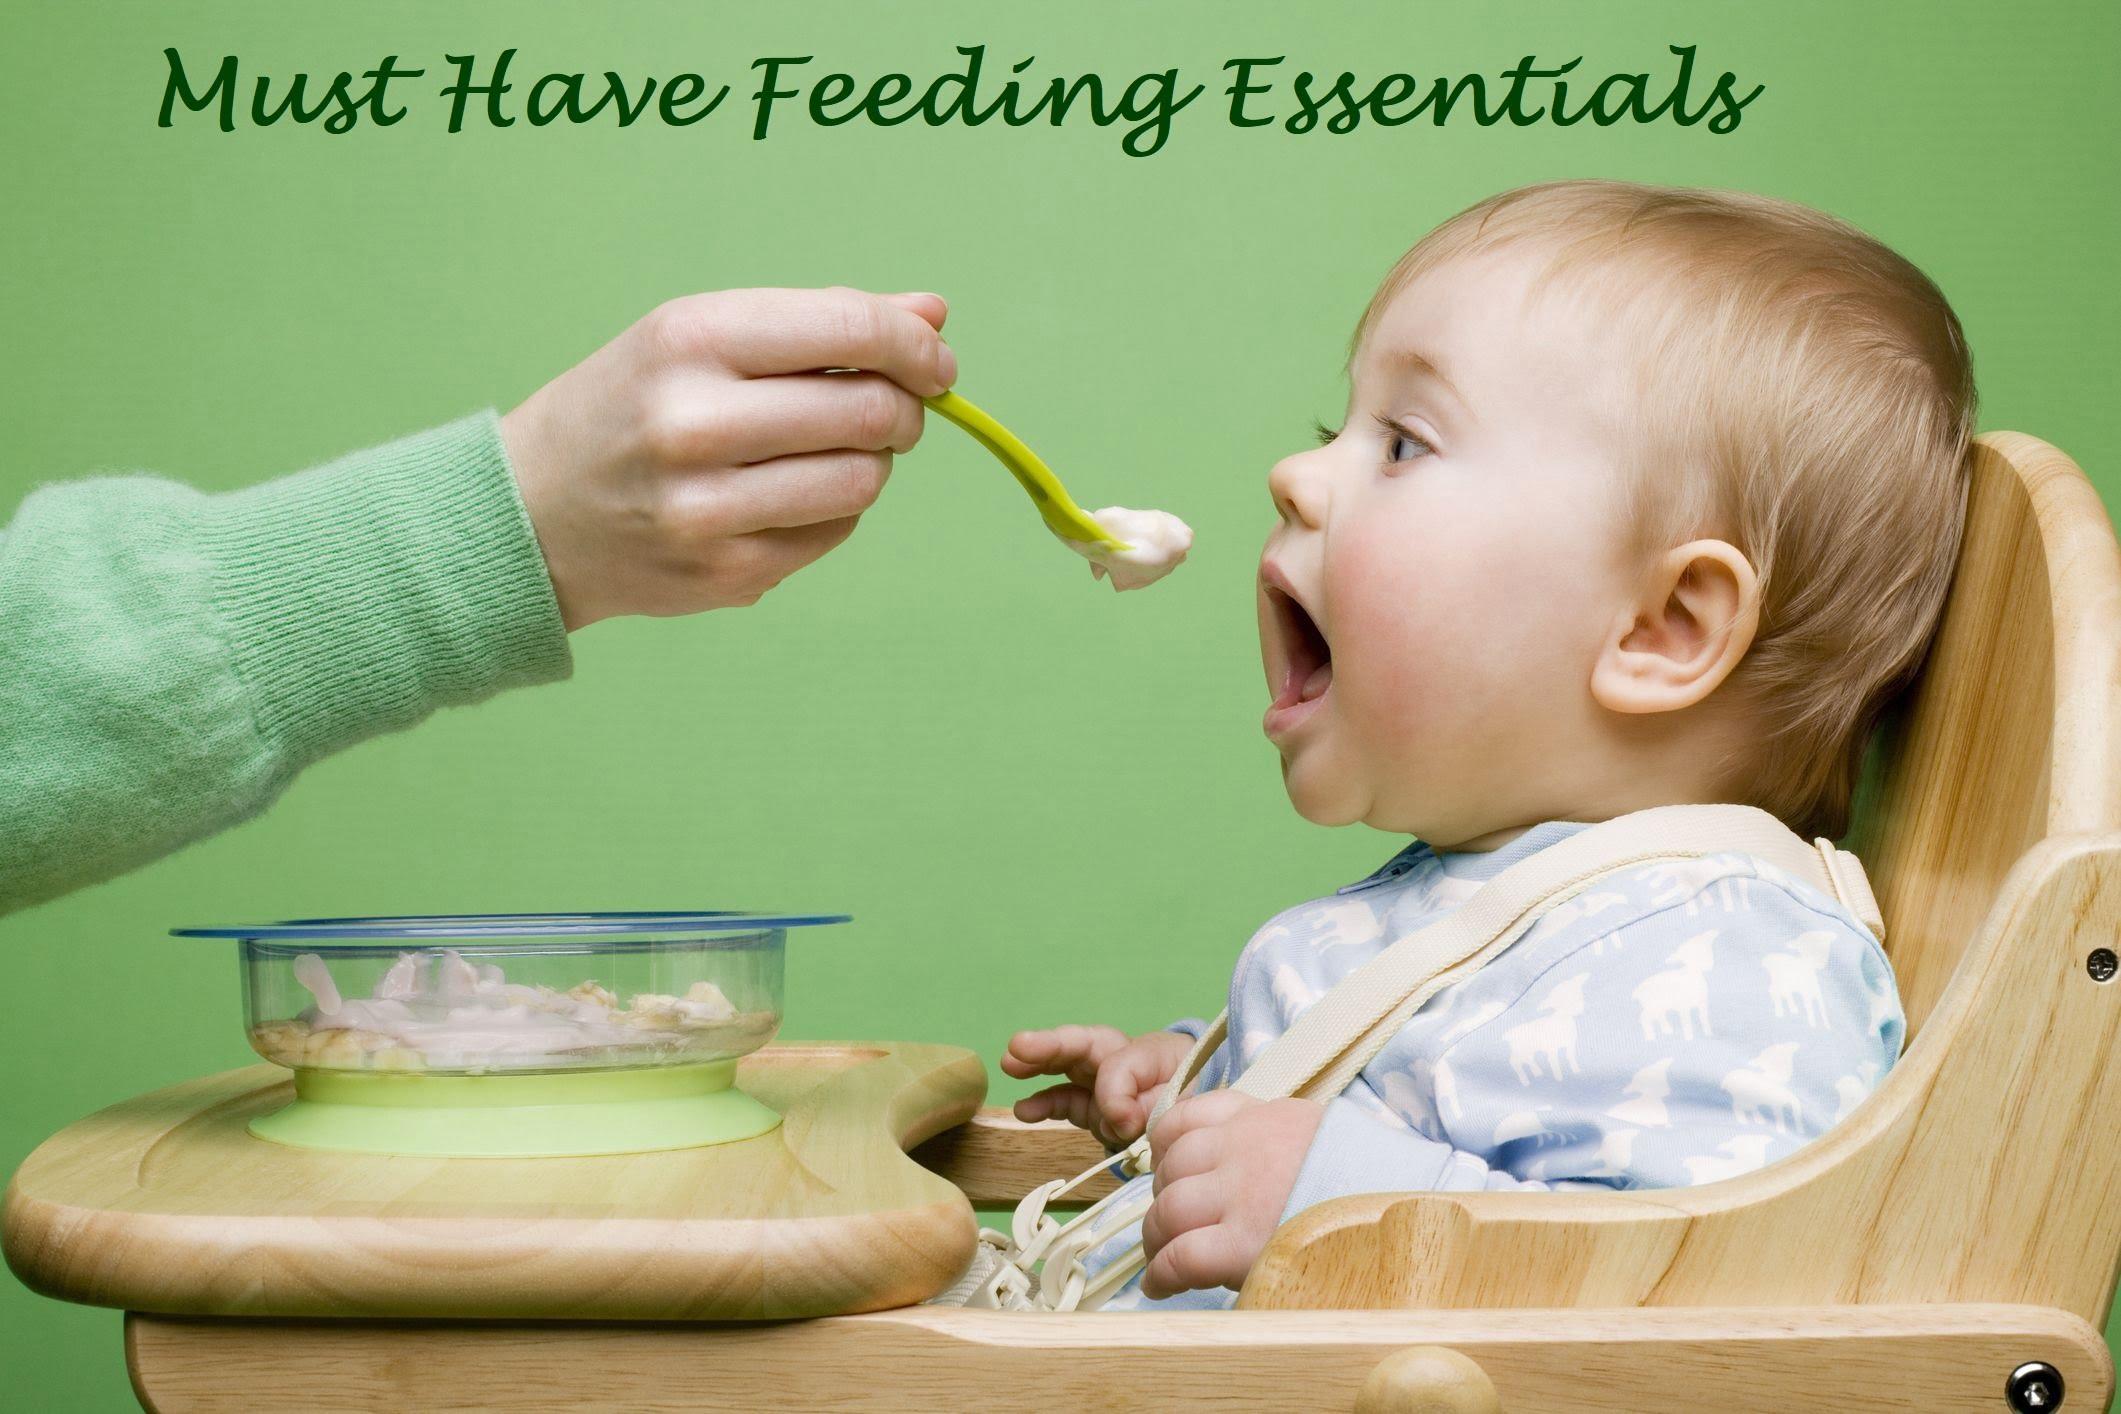 must have feeding Essentials